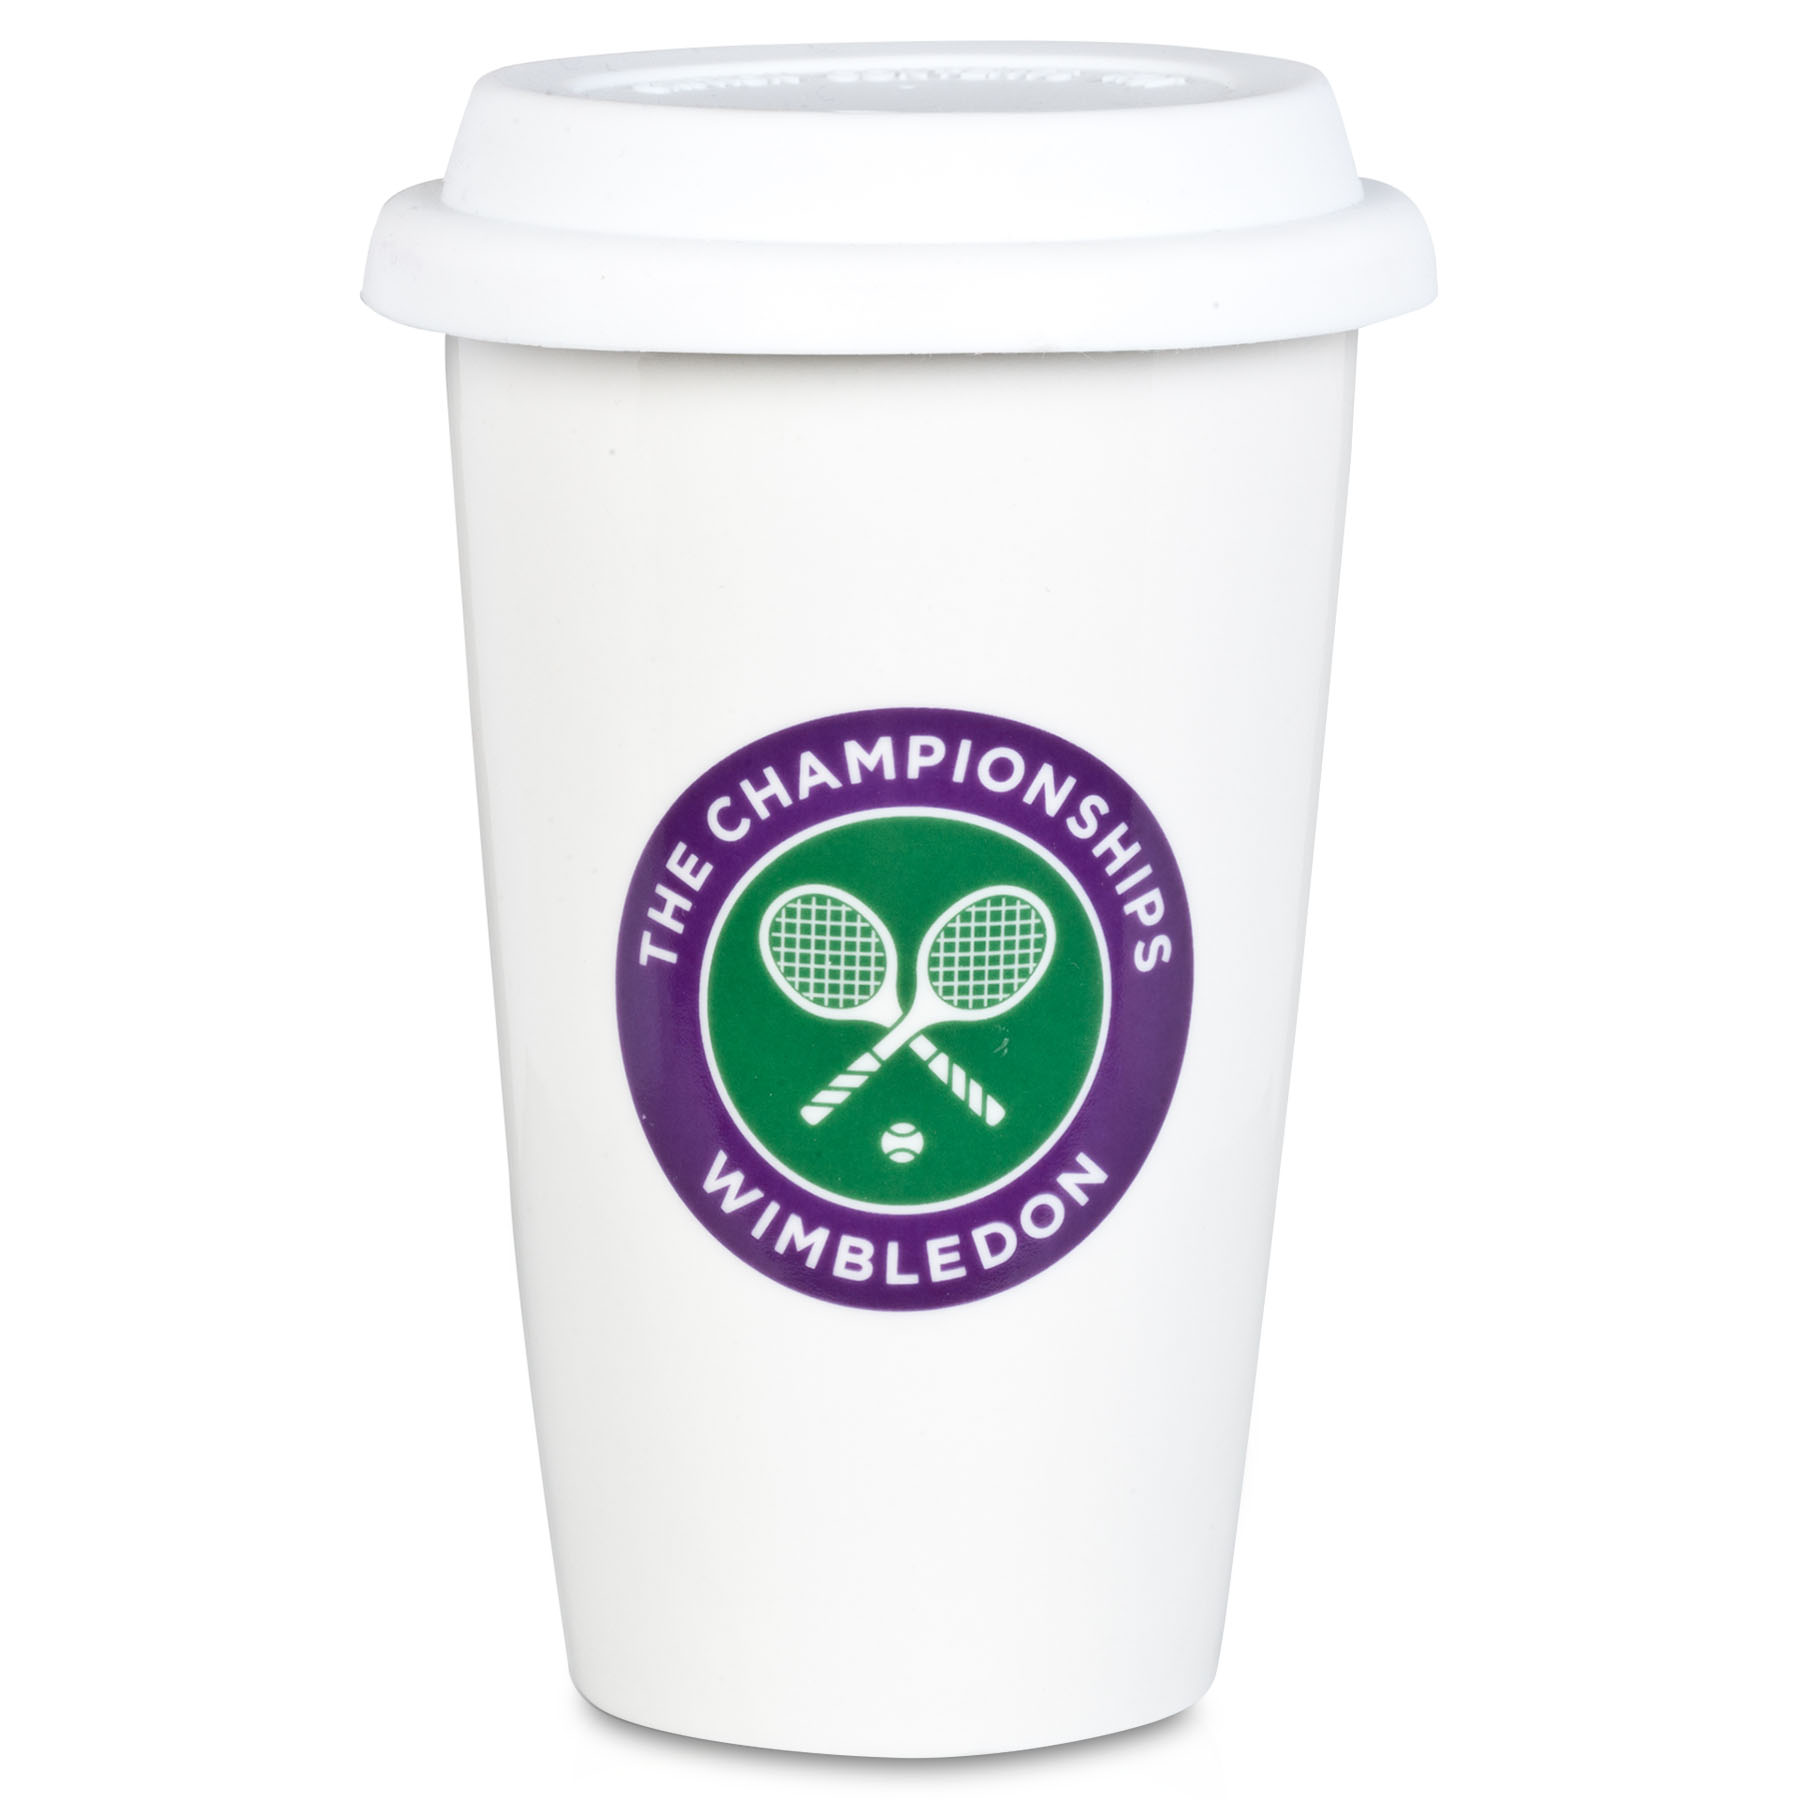 Wimbledon Take Away Coffee Mug - White